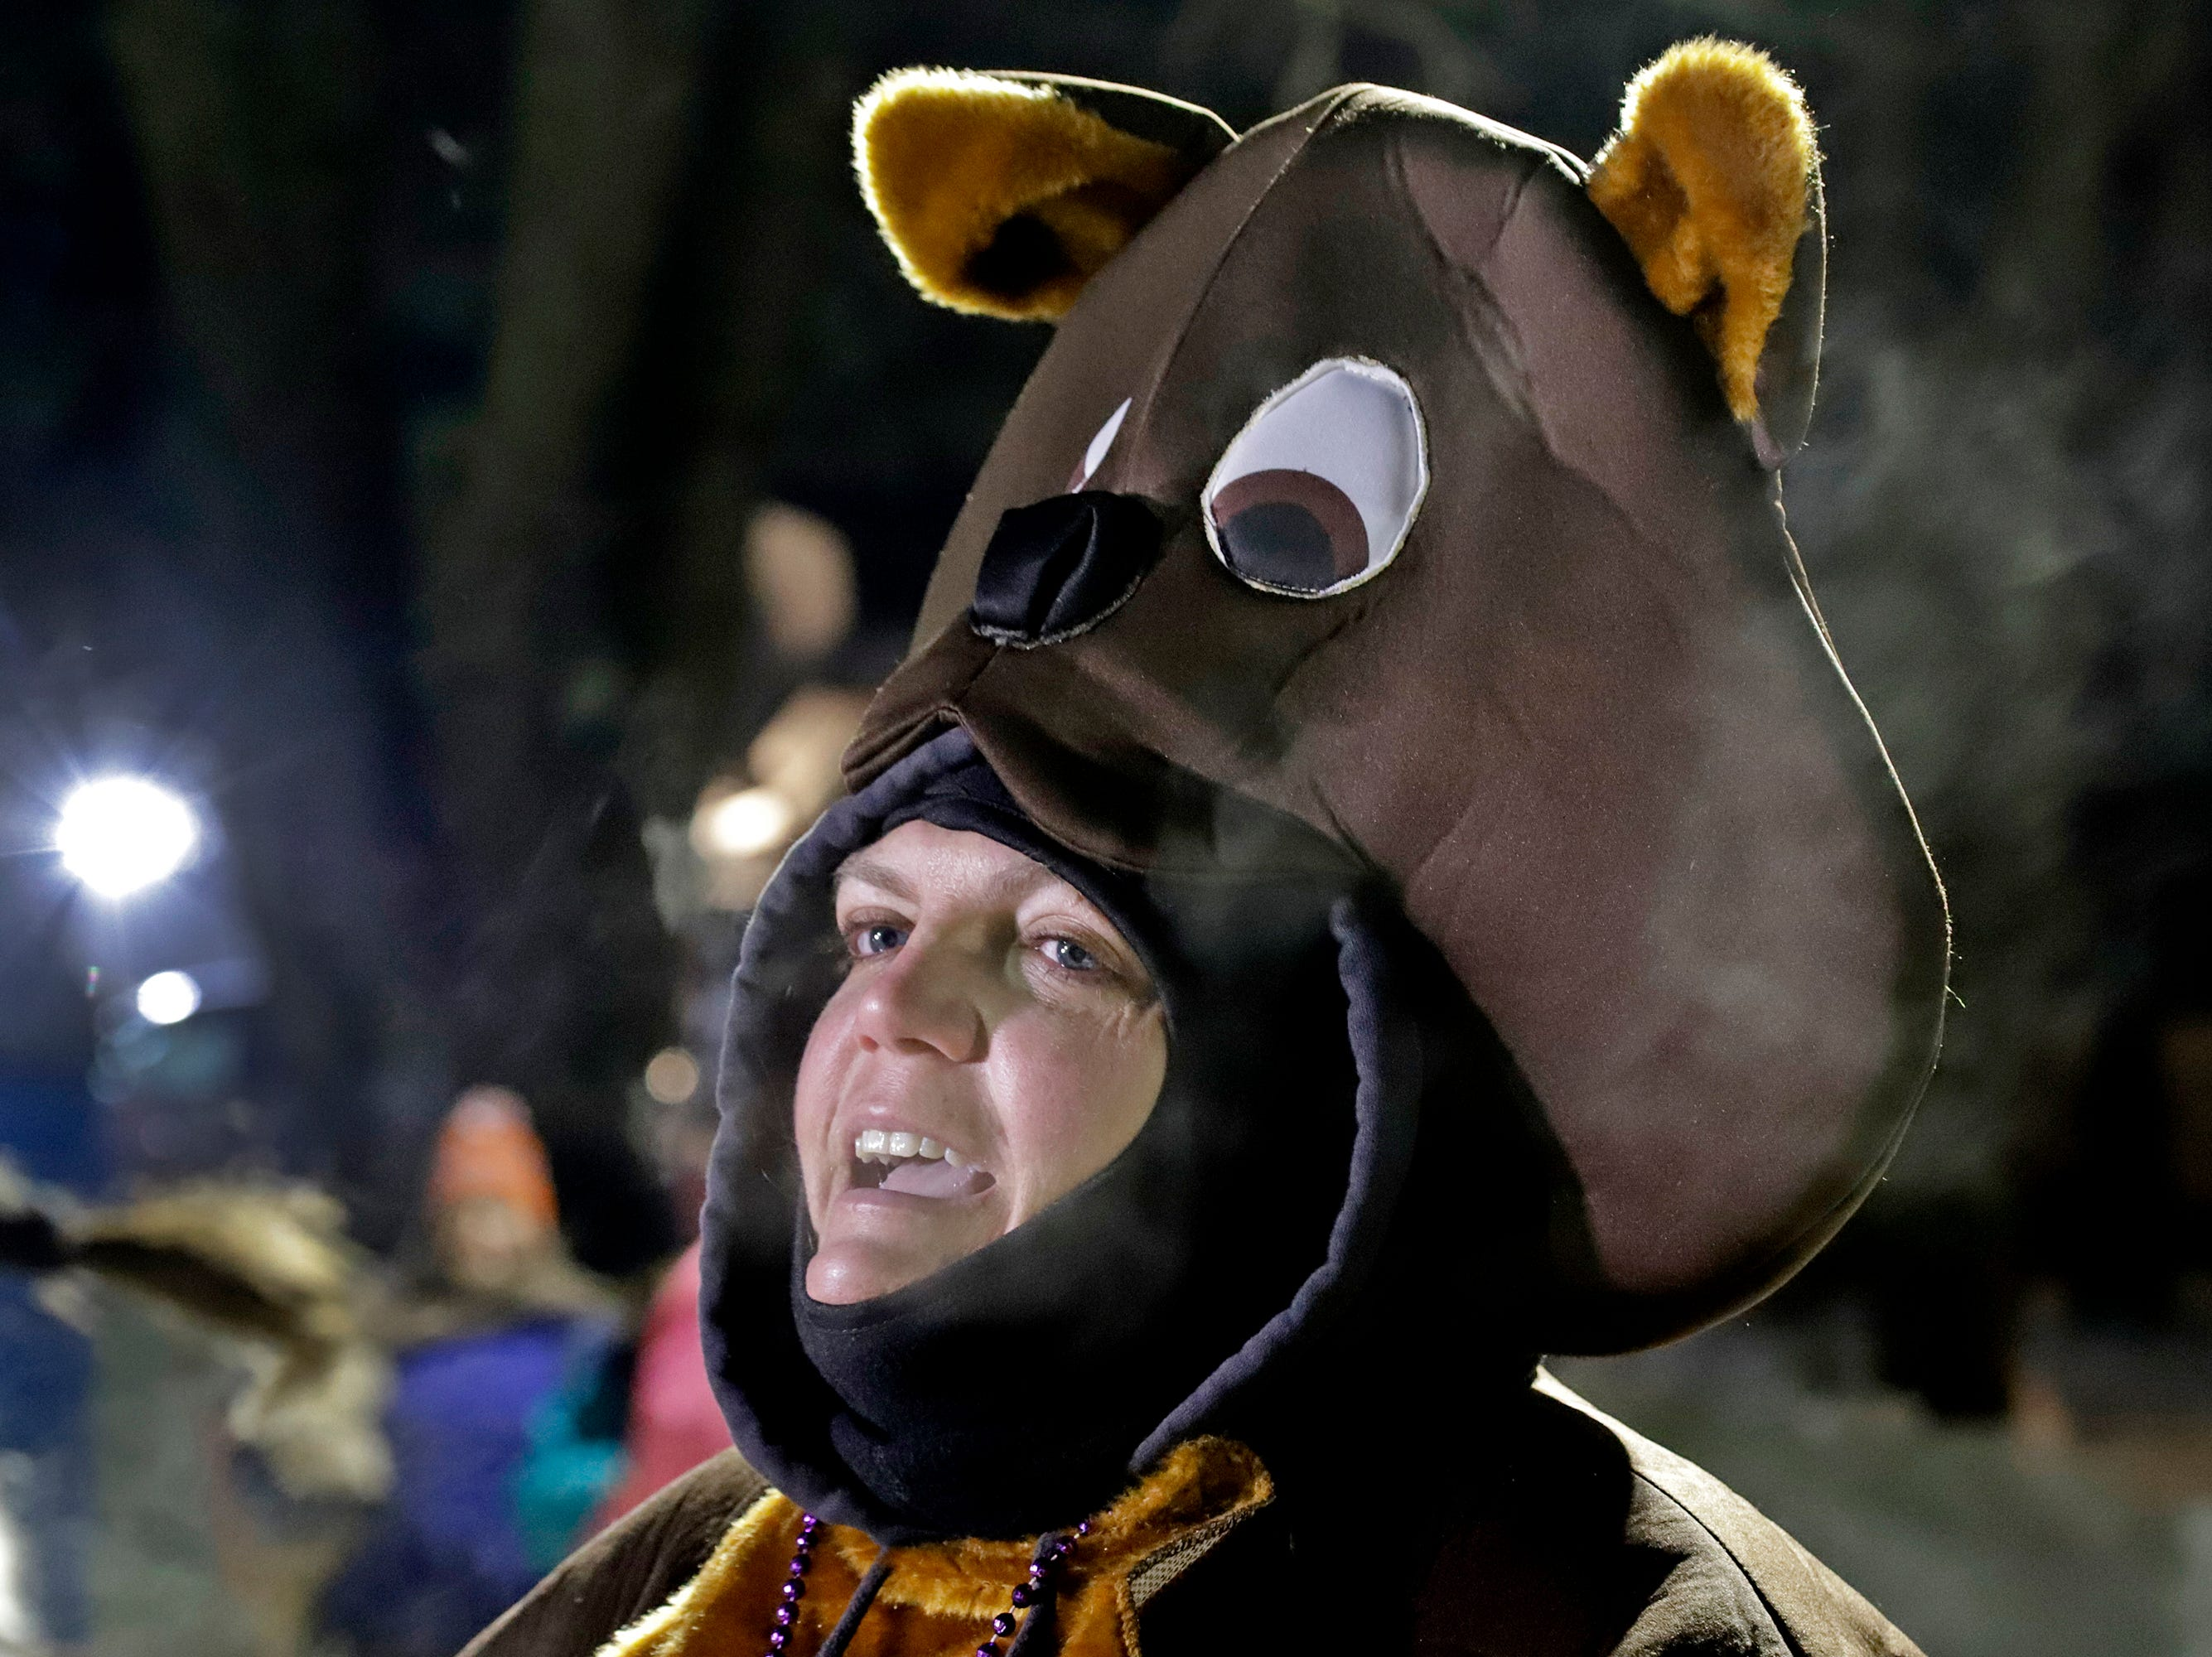 Katie Wolf of New Cumberland, Pa., wears a groundhog costume to the 133rd Groundhog Day celebration on Gobbler's Knob in Punxsutawney, Pa. Saturday, Feb. 2, 2019. (AP Photo/Gene J. Puskar)